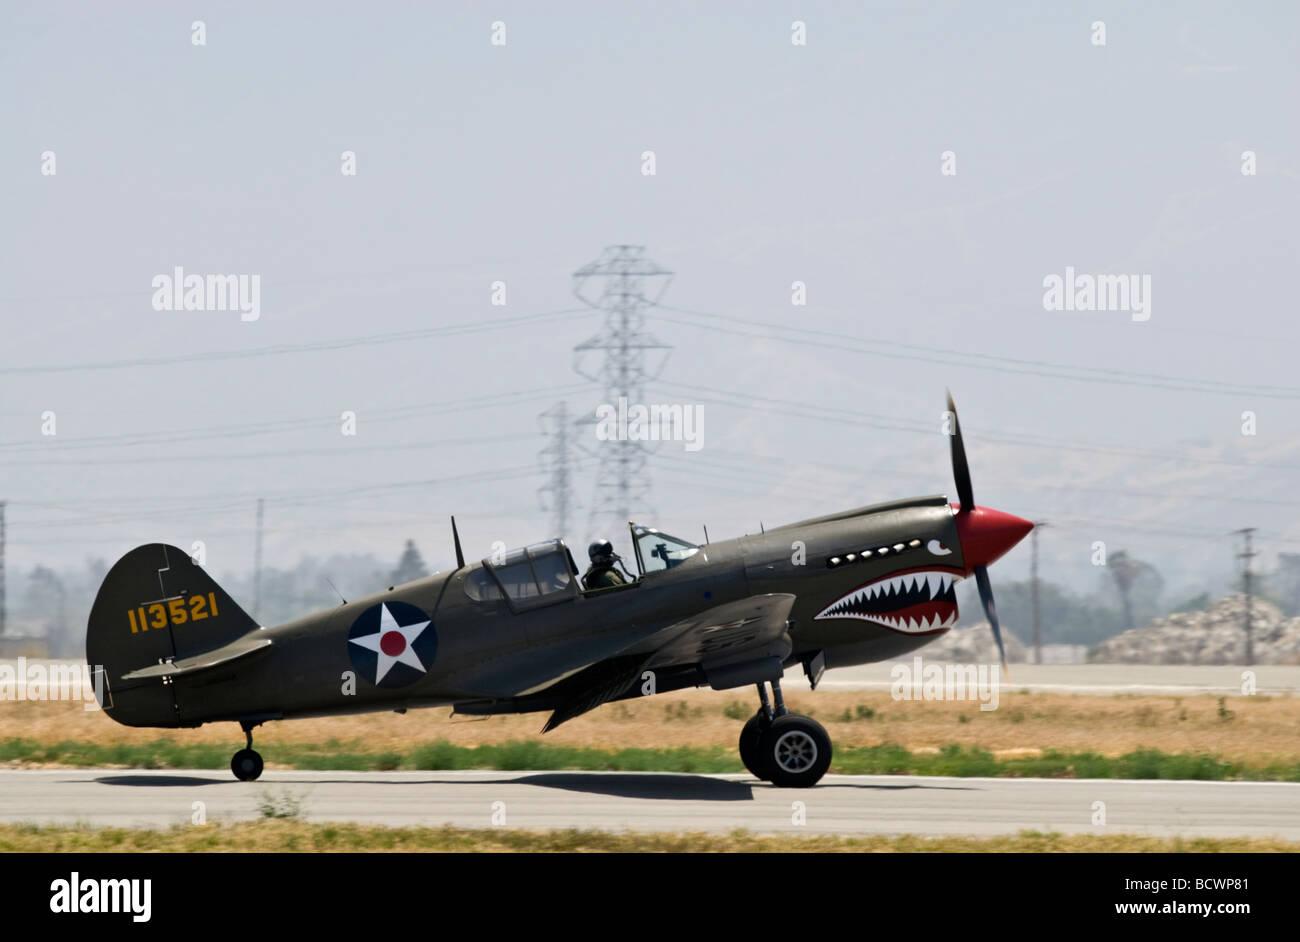 Curtiss P 40 Kittyhawk Stock Photos & Curtiss P 40 Kittyhawk